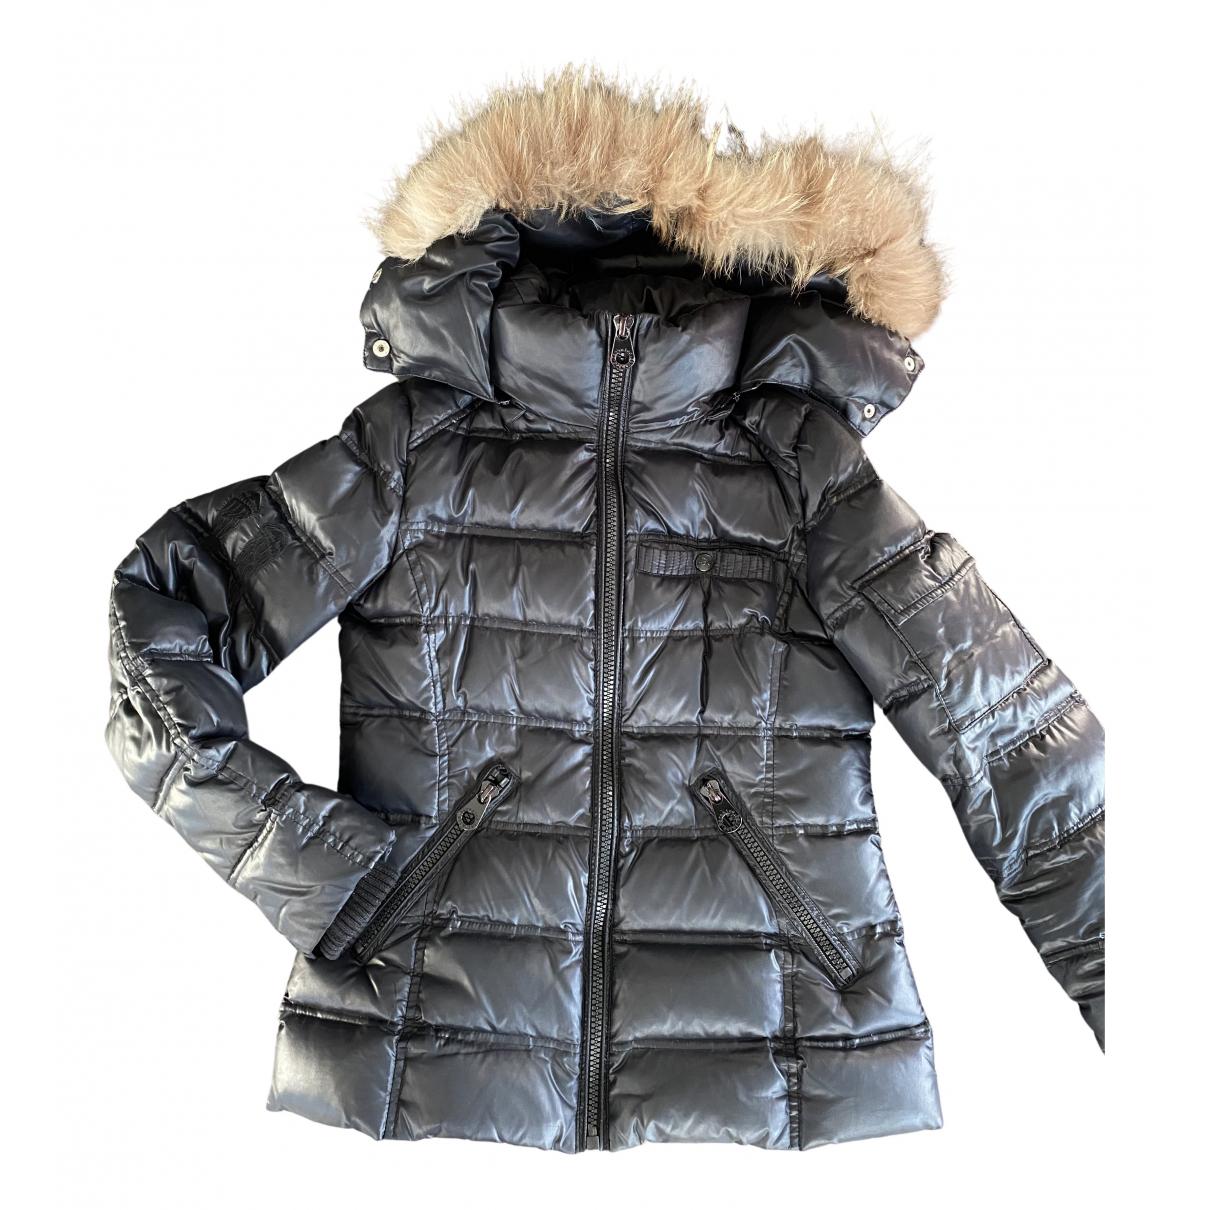 Berenice N Black coat for Women XS International